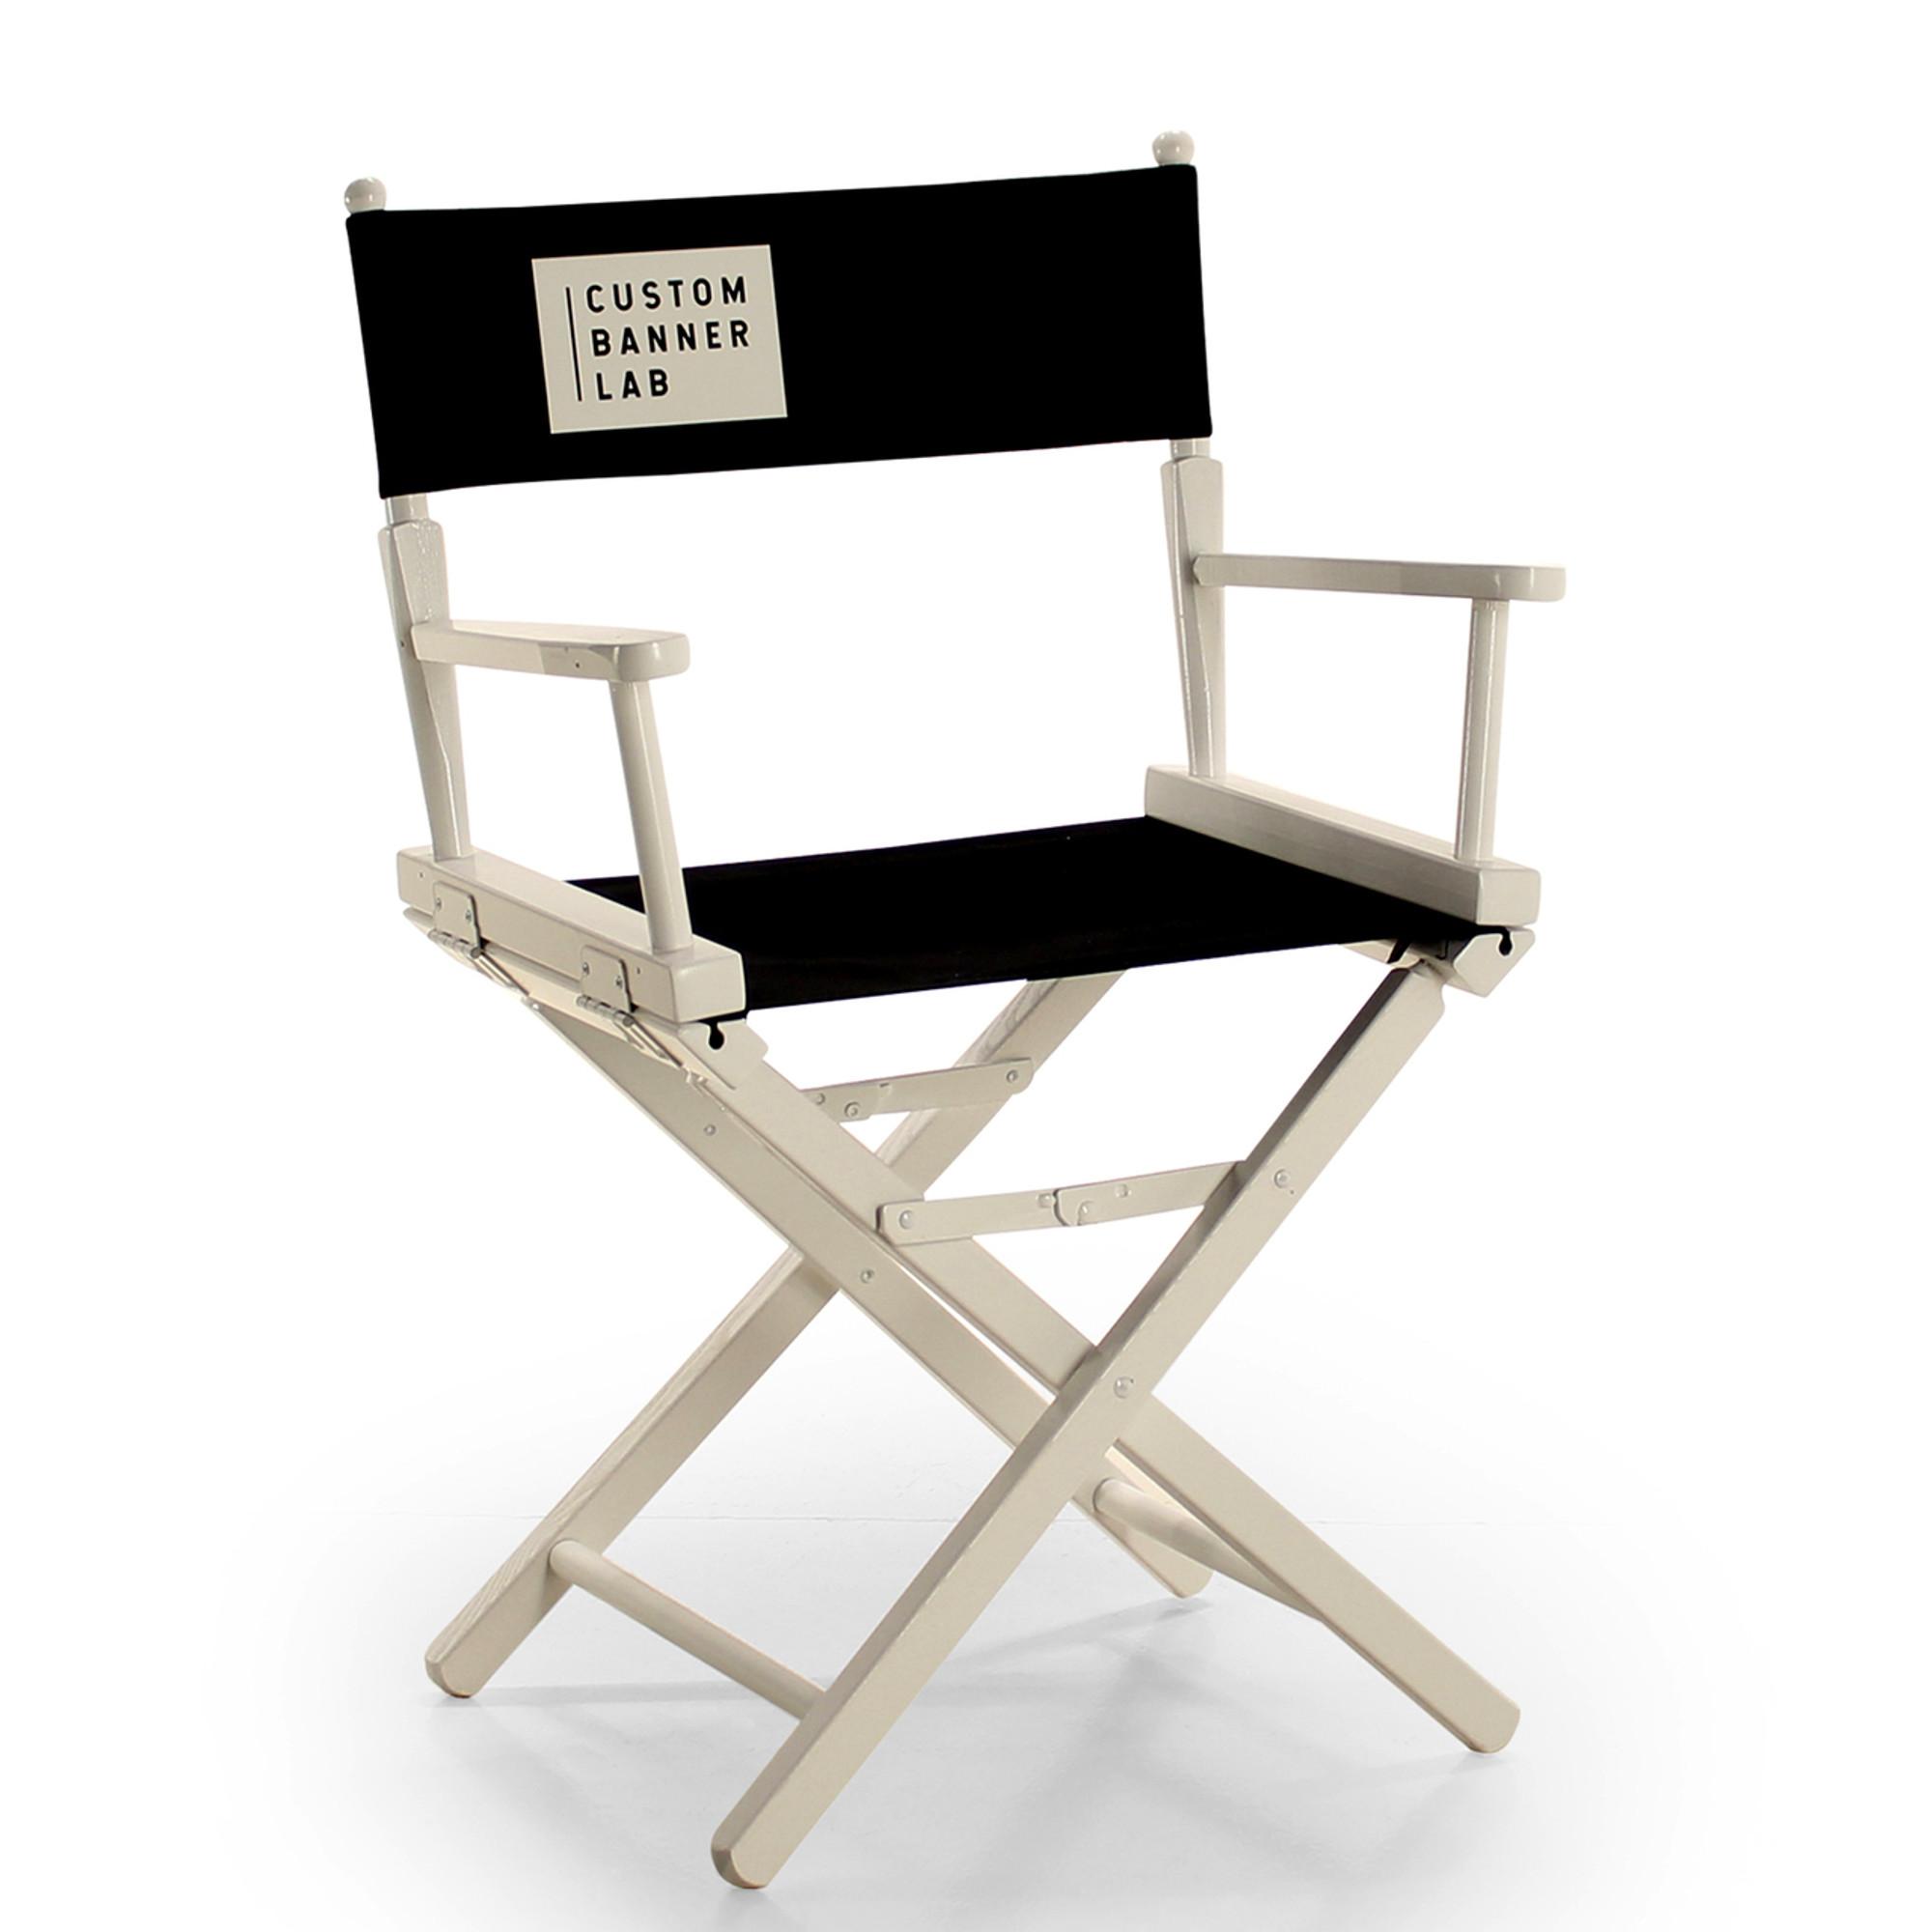 Pleasant Custom Printed Logo Directors Chair Unemploymentrelief Wooden Chair Designs For Living Room Unemploymentrelieforg